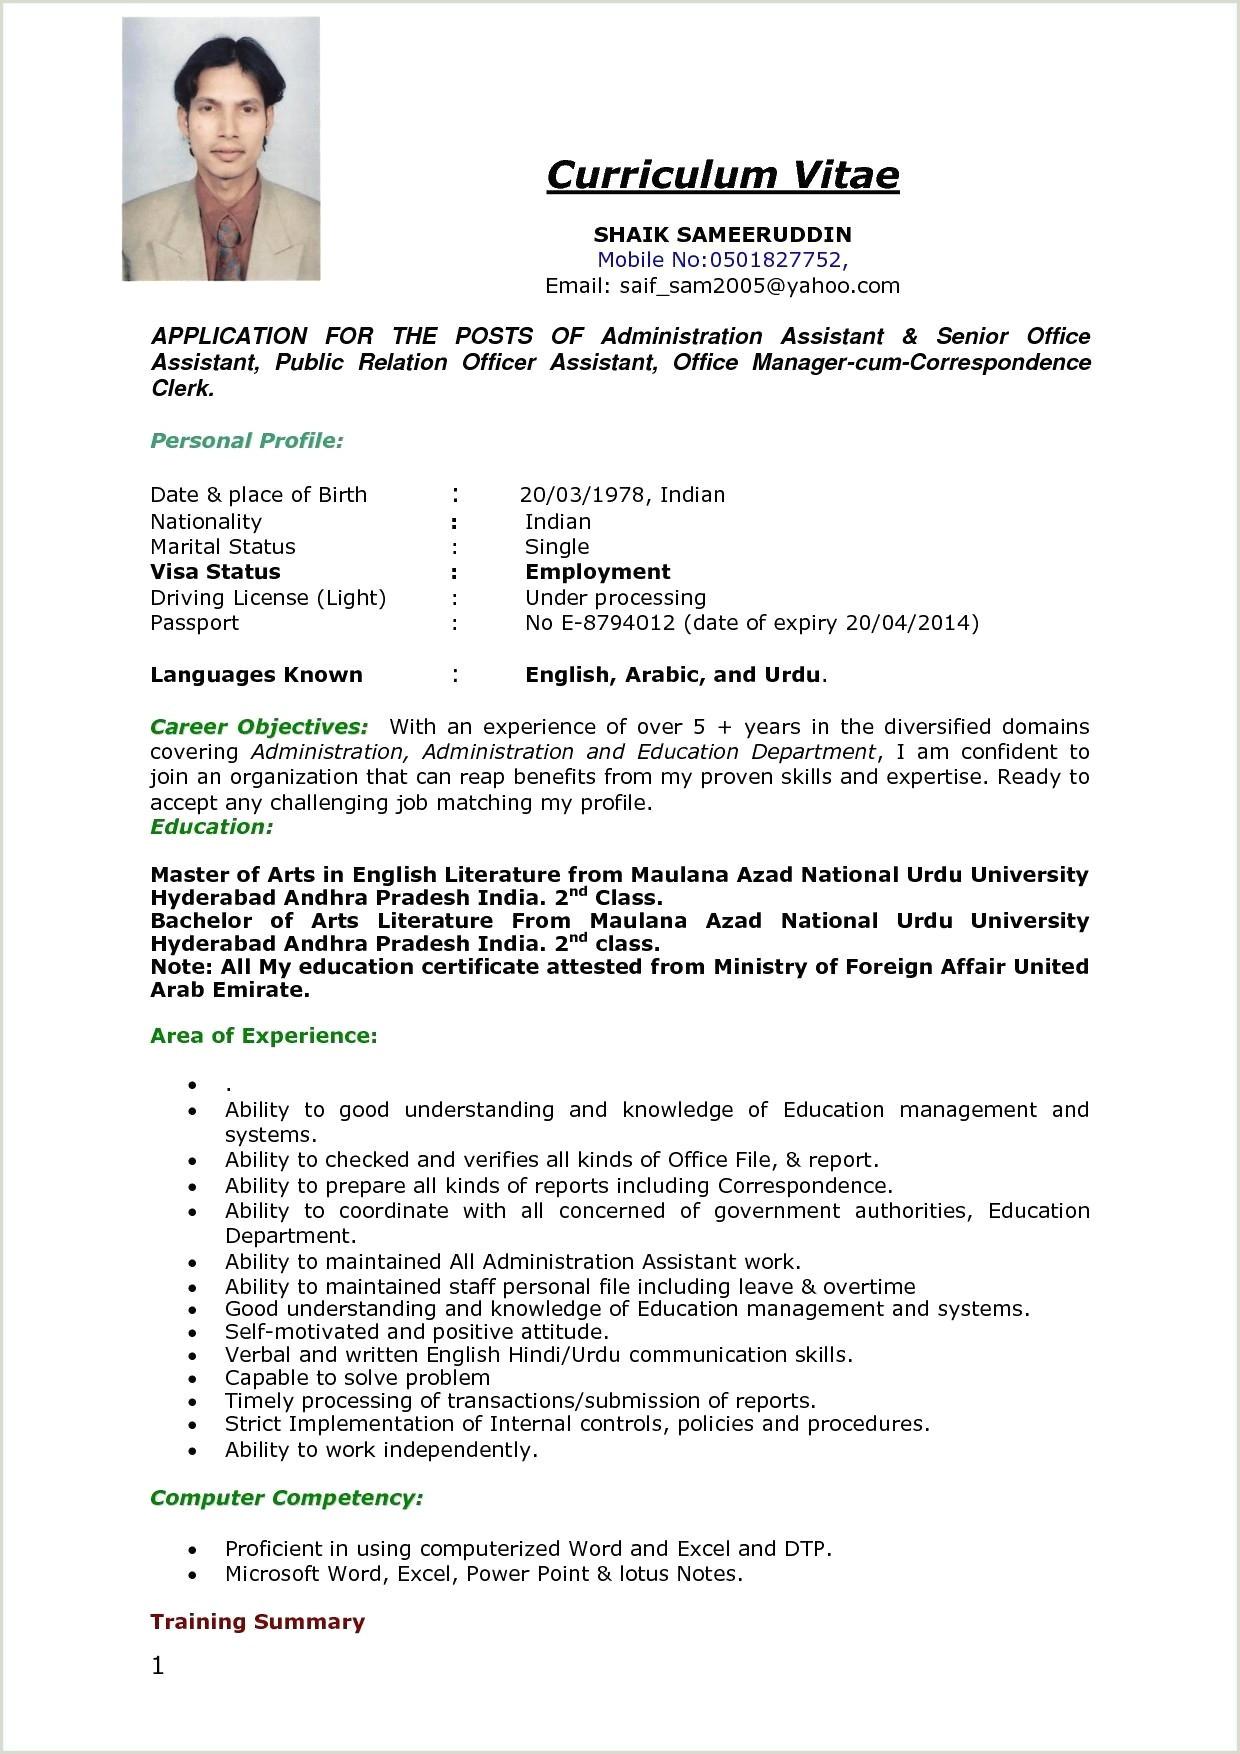 Resume format for Teacher Job In Pdf Cv format Pdf India